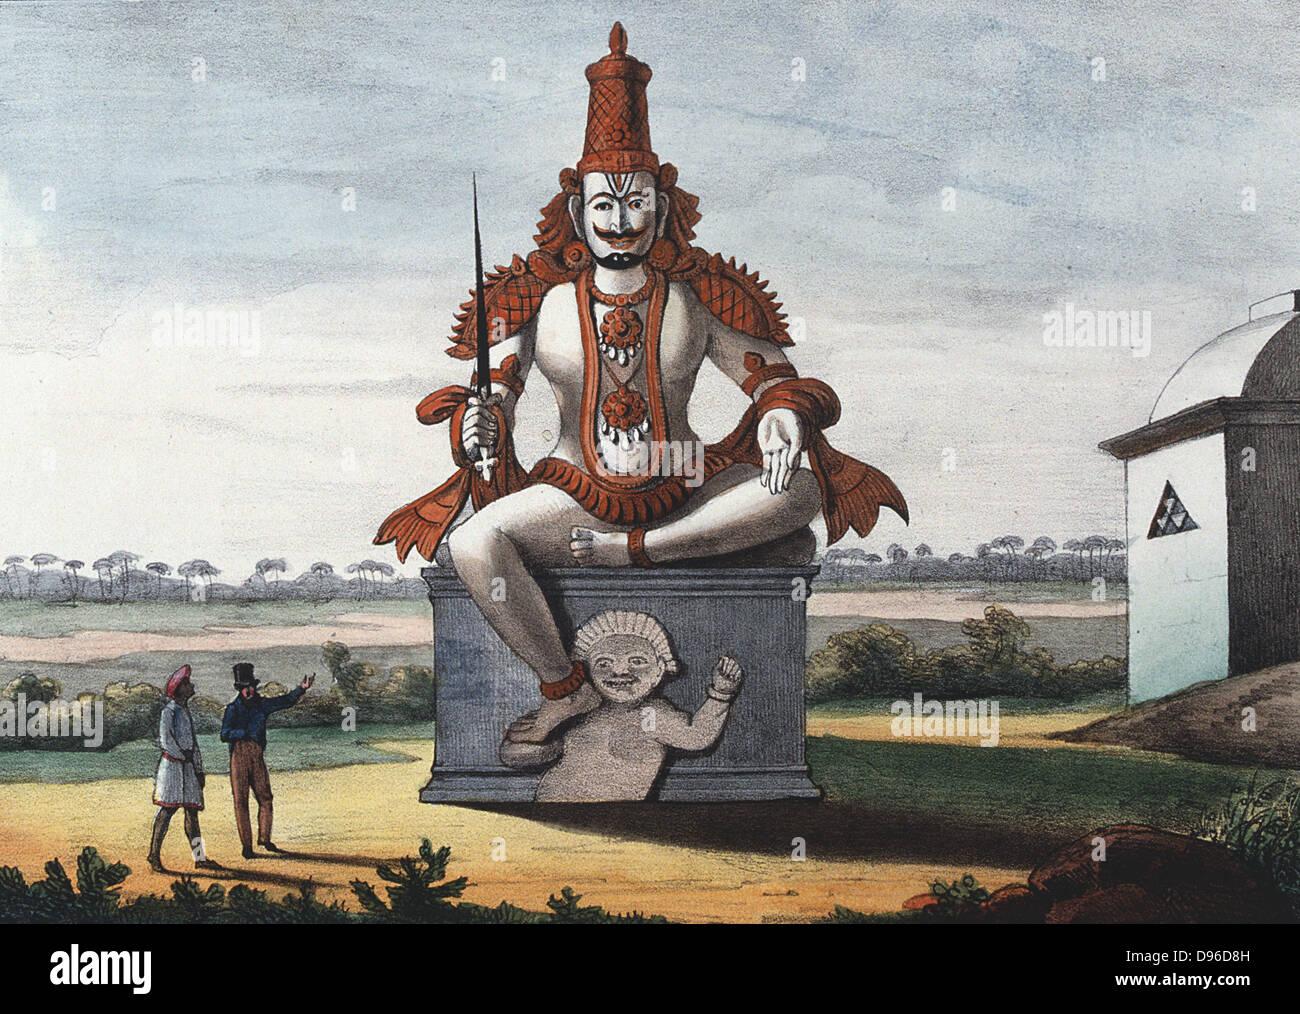 Statua di un Indù male genie. Litografia colorata da 'L'Inde francaise', 1828 Immagini Stock